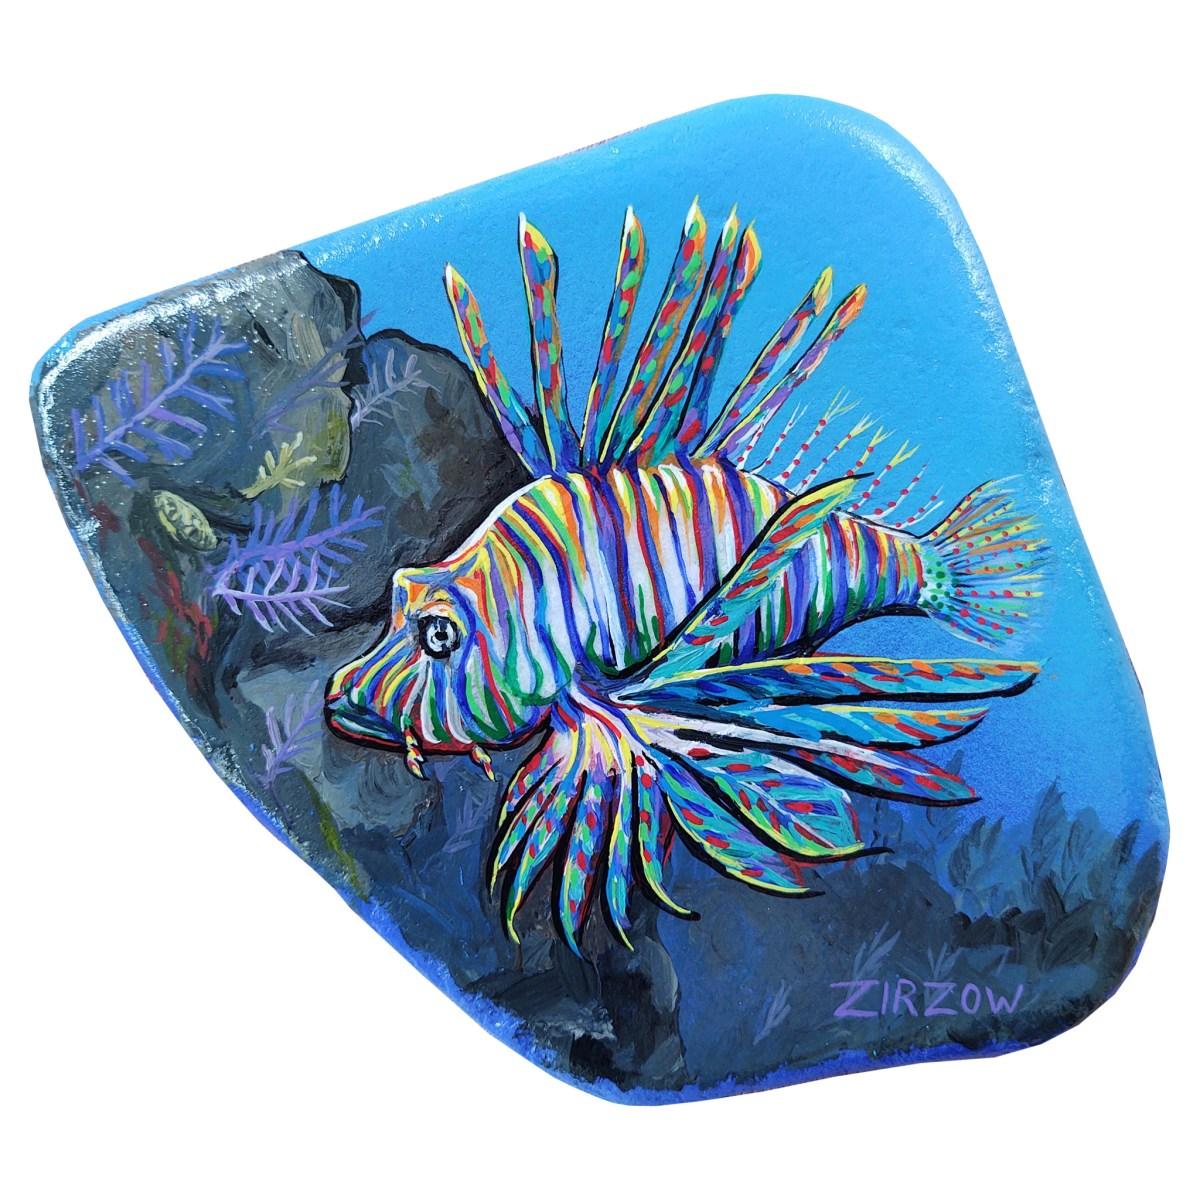 Lionfish | Ocean Life Rocks